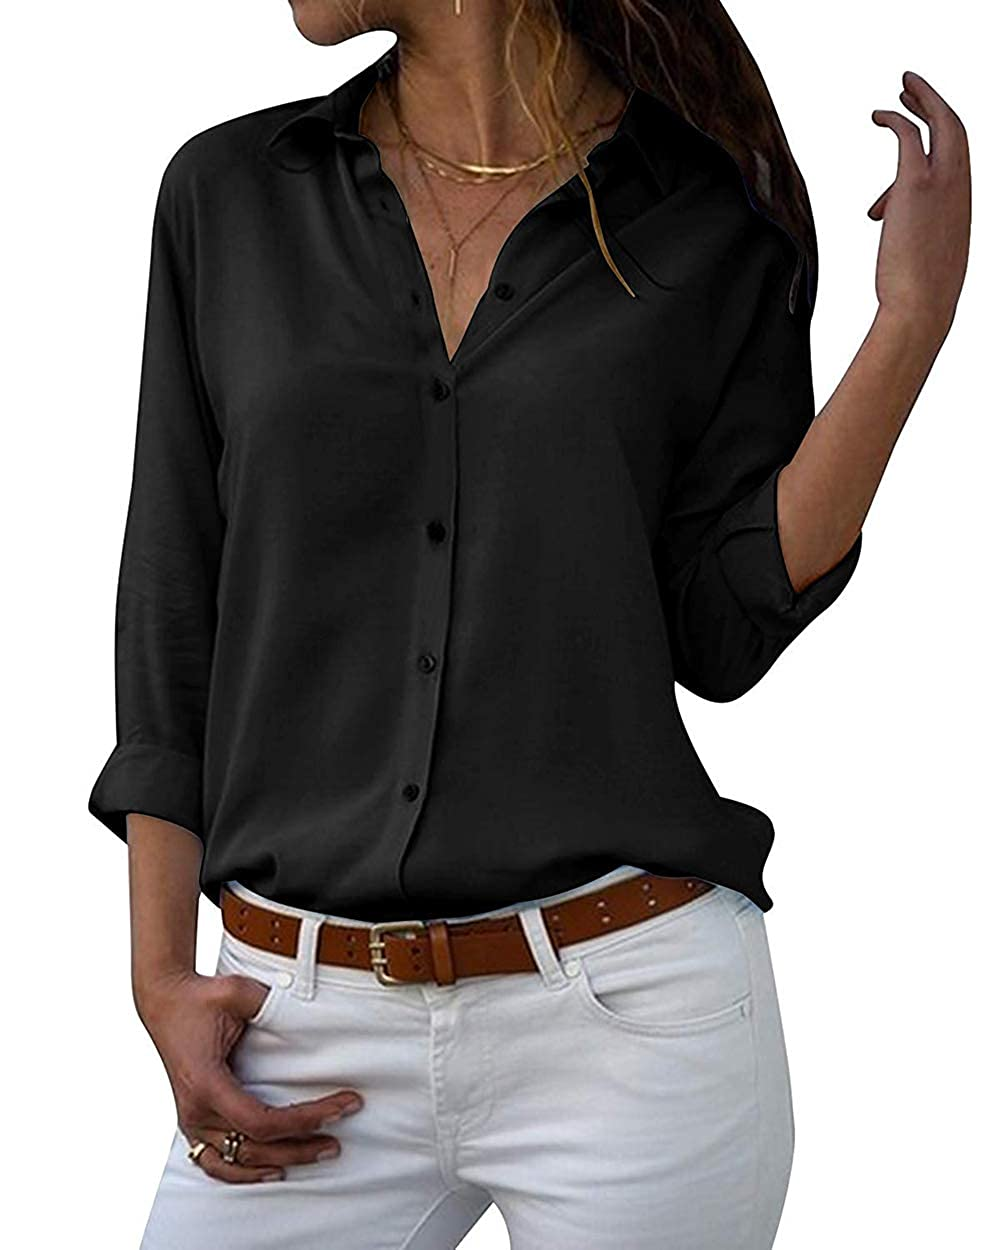 Yieune Chiffon Bluse Elegant Damen Langarmshirt V-Ausschnitt Casual Oberteile Hemd Lose Shirt